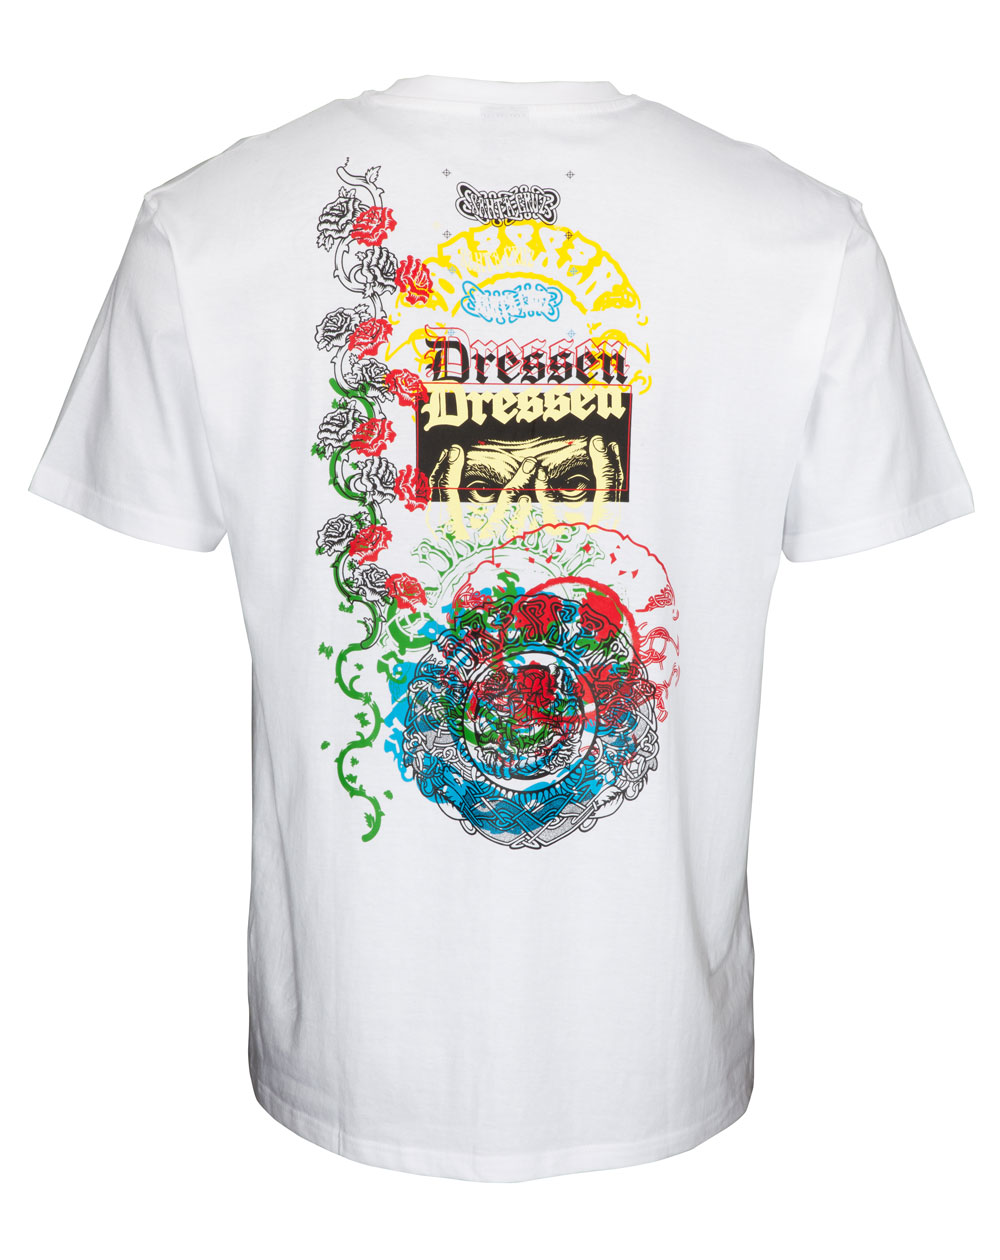 Santa Cruz Dressen Archive T-Shirt Uomo White